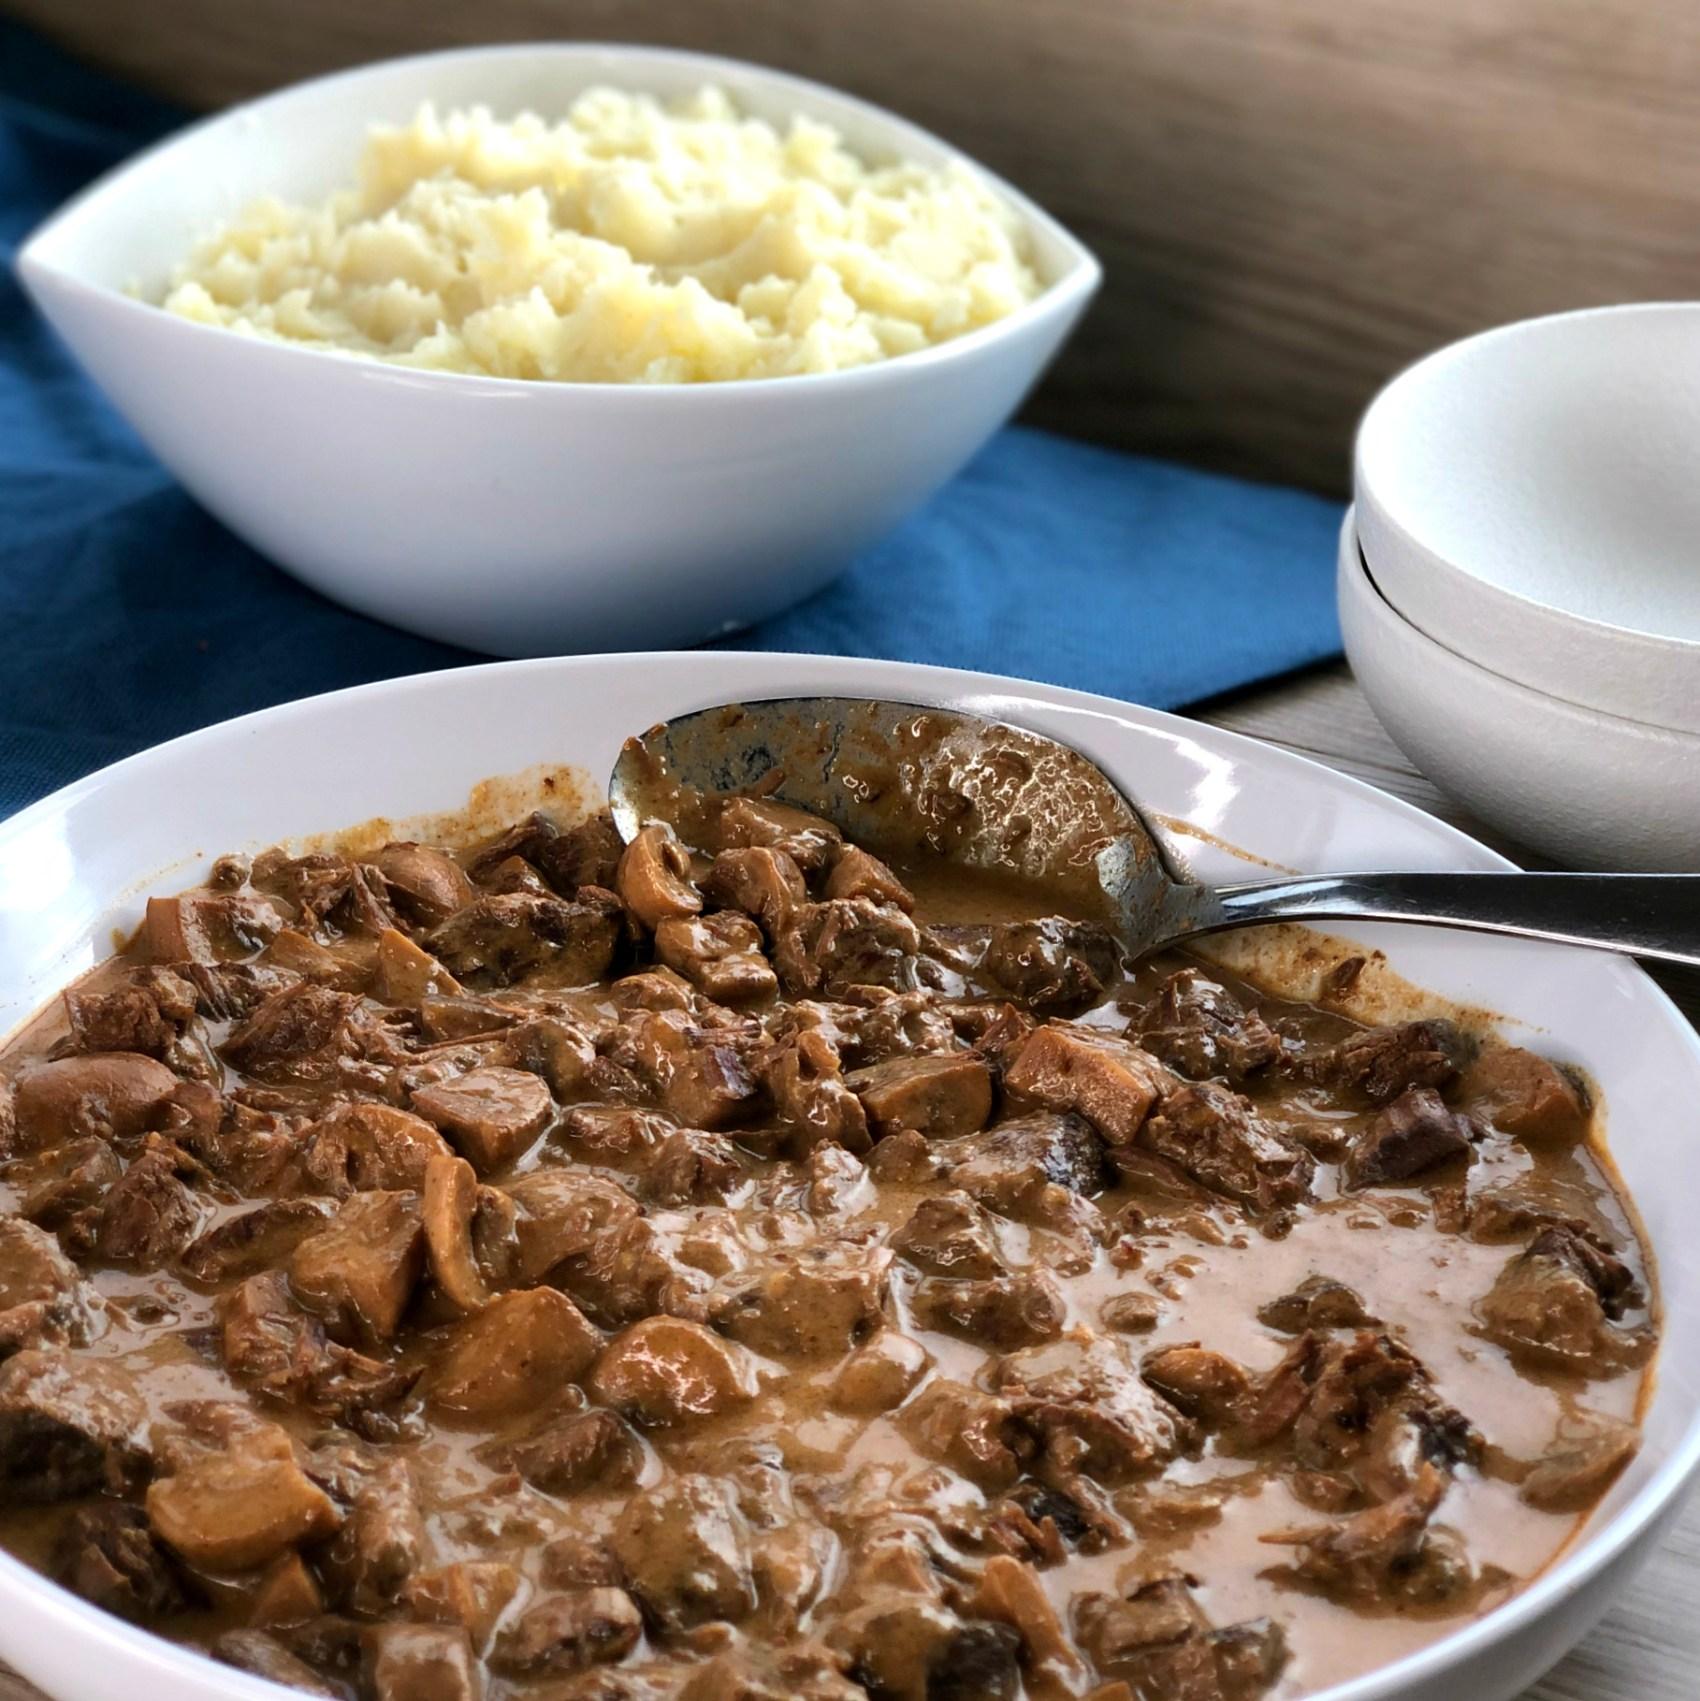 Delicious Homemade Beef Stroganoff